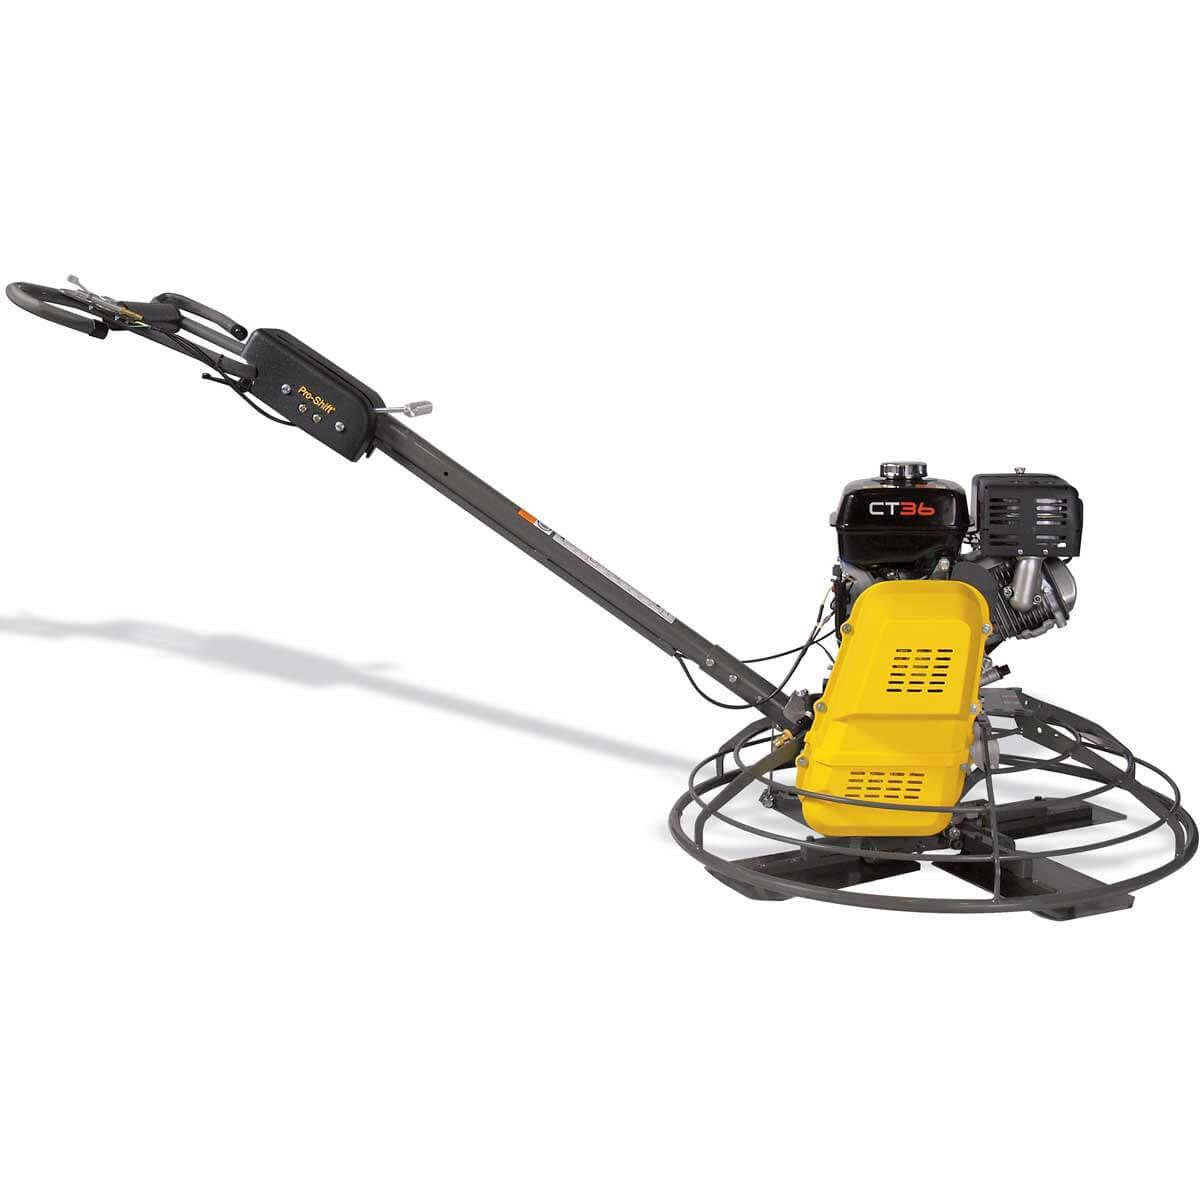 Wacker Neuson CT-36-5A Power Trowel